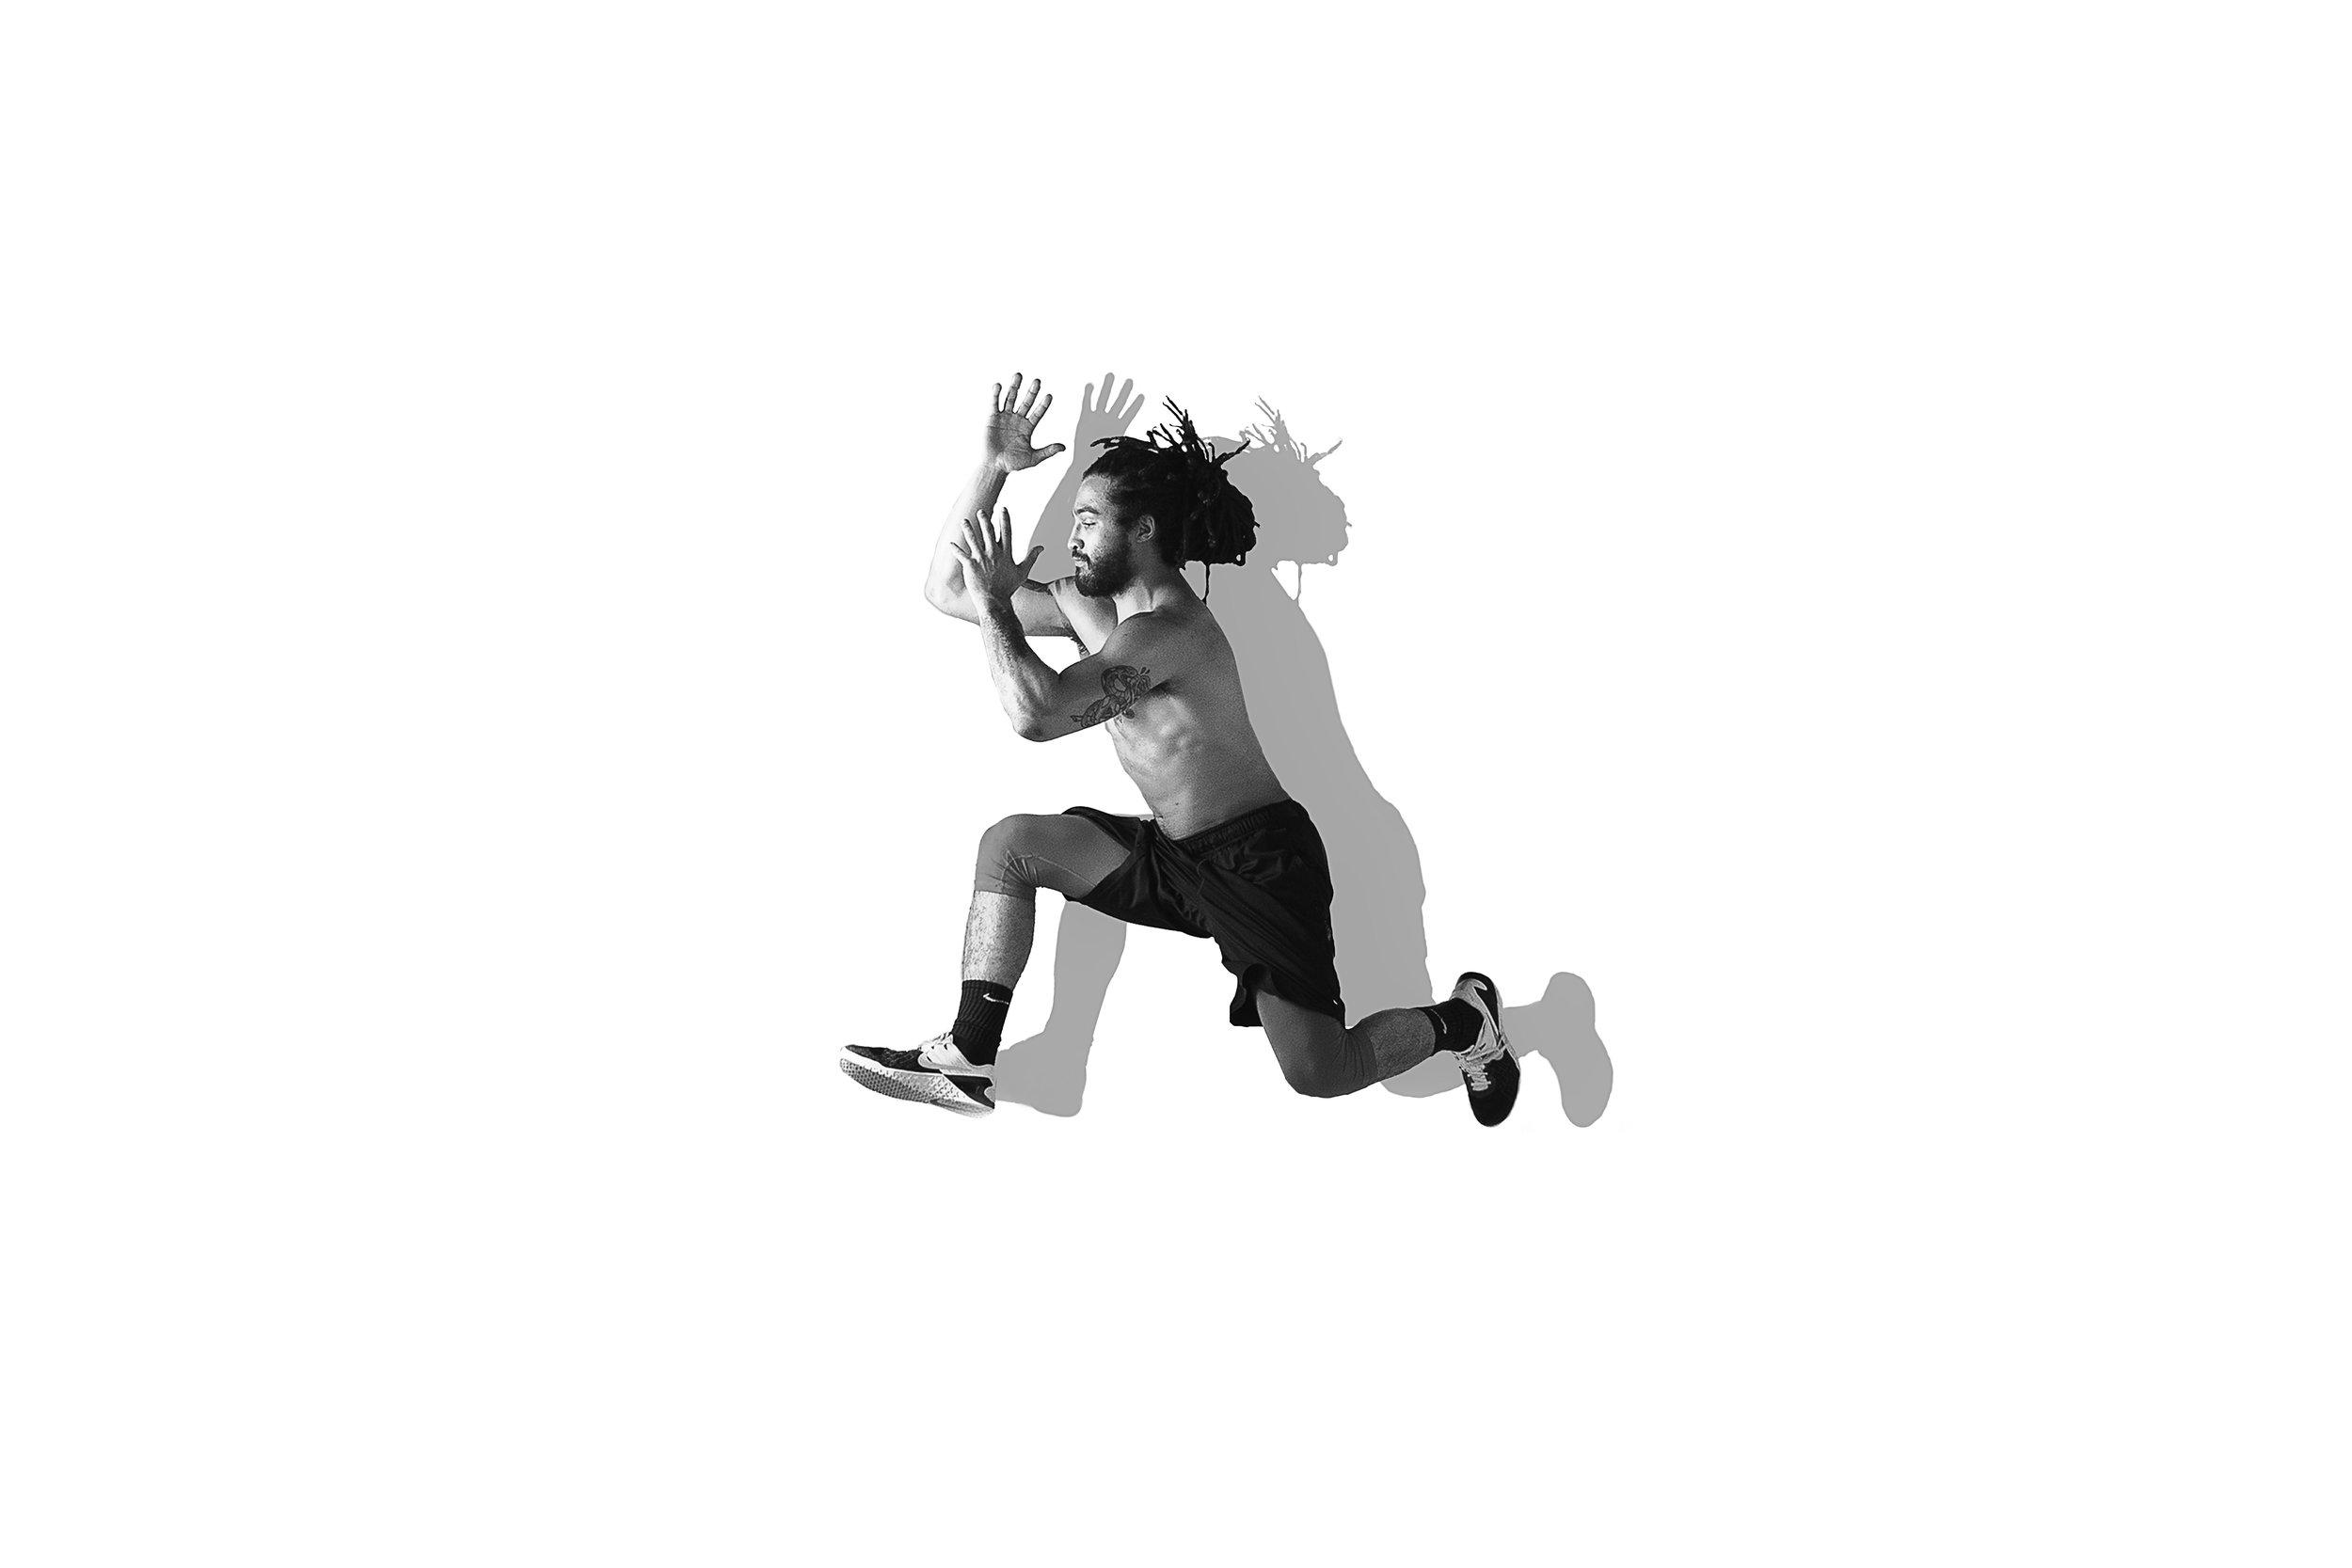 PEdro-Sports1179_Cordell_Jump.jpg